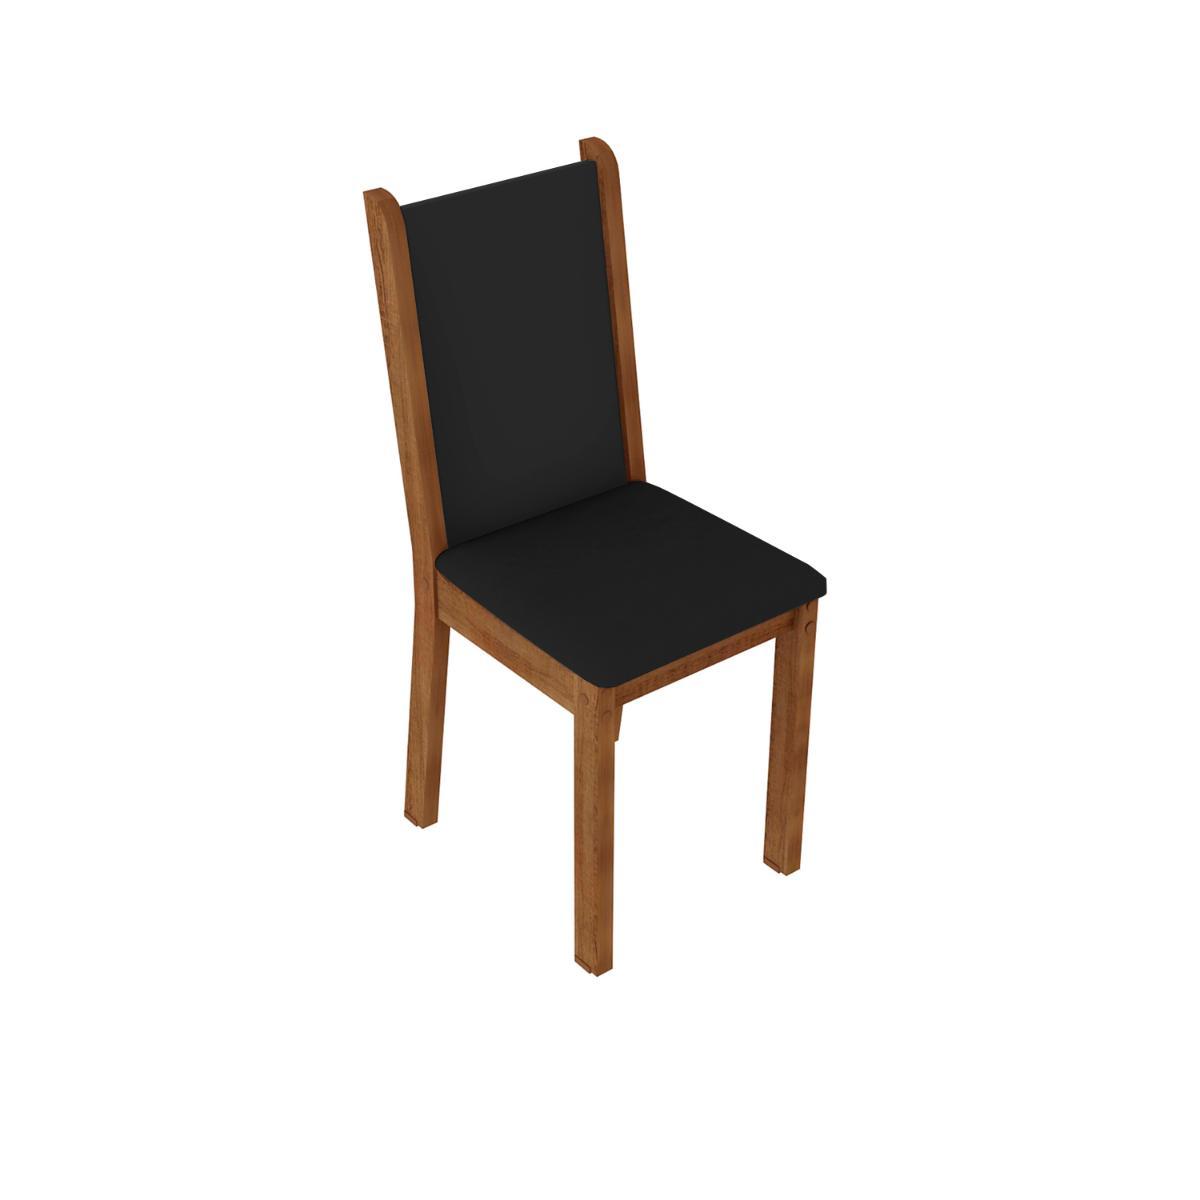 Kit 4 Cadeiras 4291 Madesa Rustic/Preto